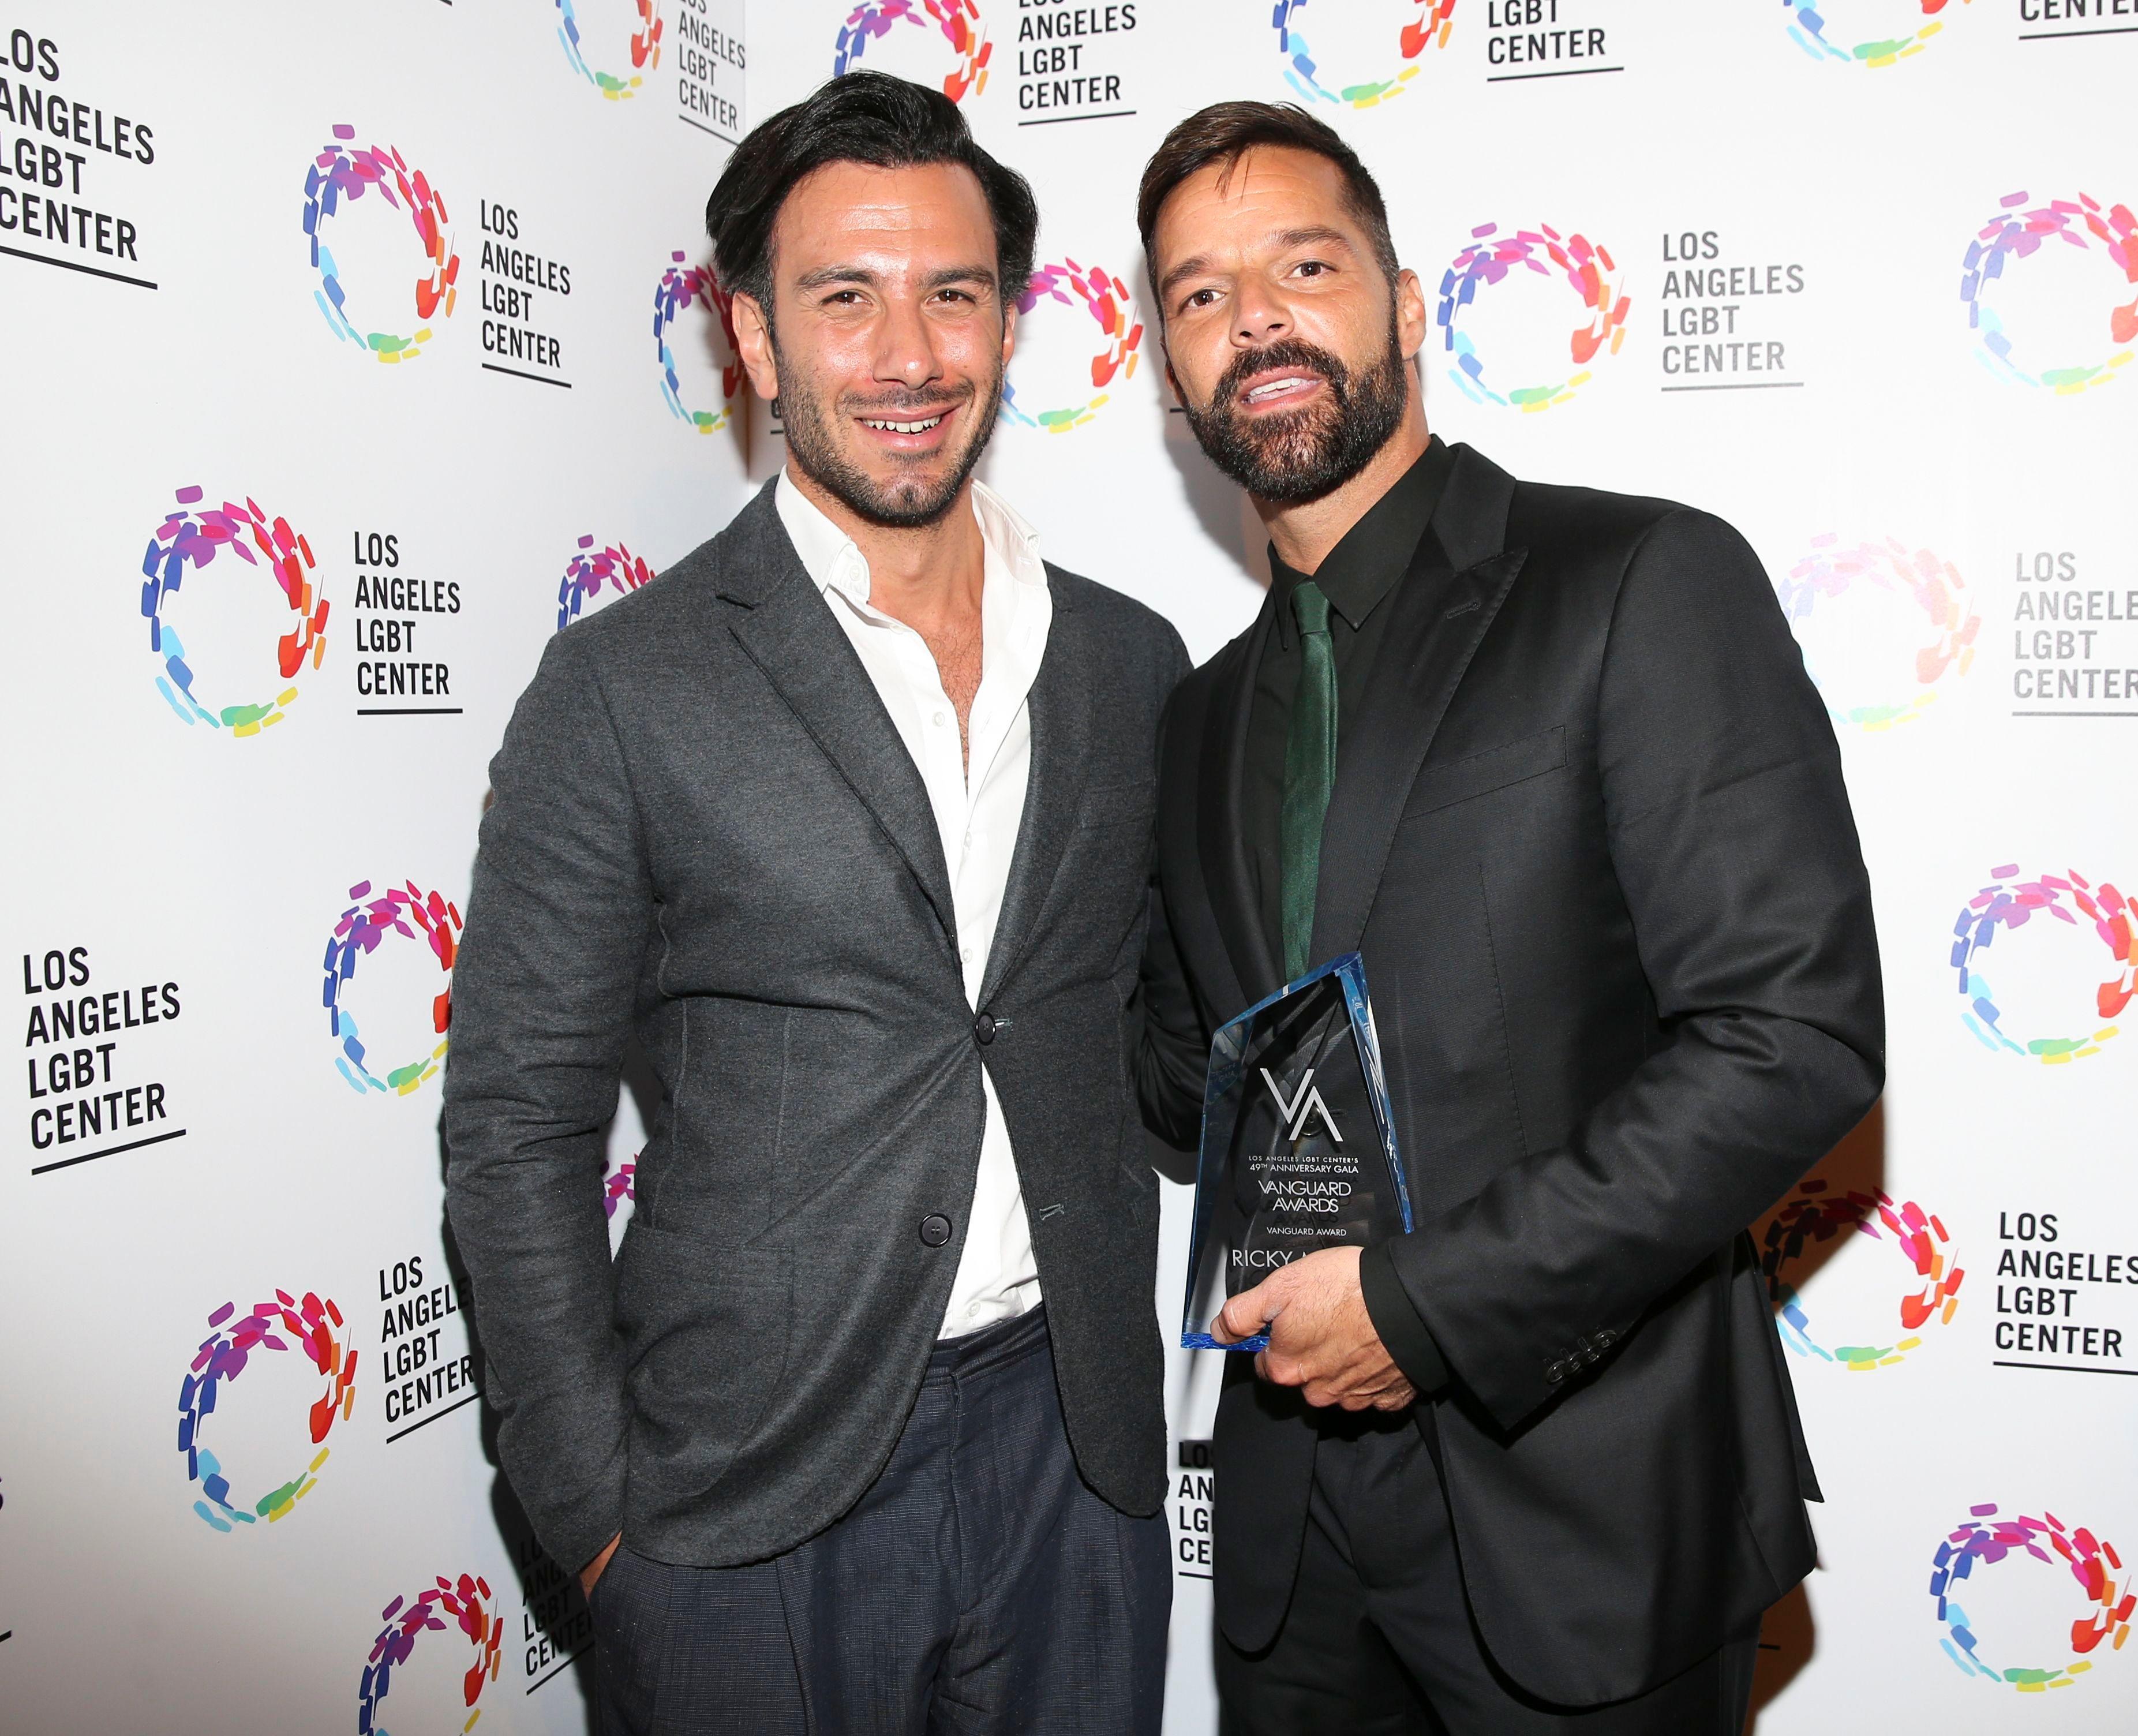 49th Anniversary Gala Vanguard Awards, Backstage, Los Angeles LGBT Center,  USA - 22 Sep 2018